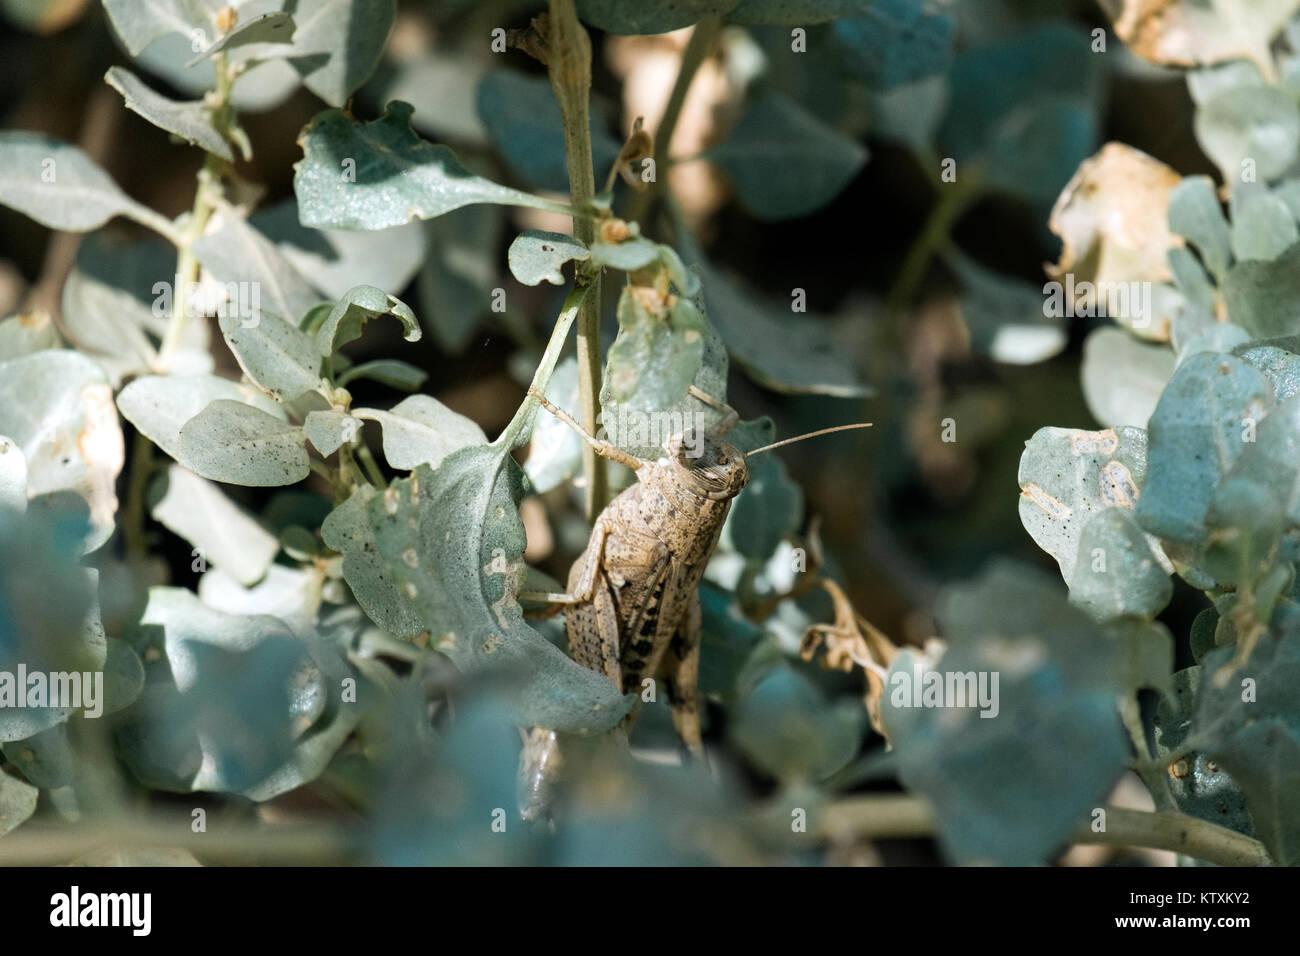 Migratory locust sitting among the green foliage of the bush (Locusta migratoria) - Stock Image